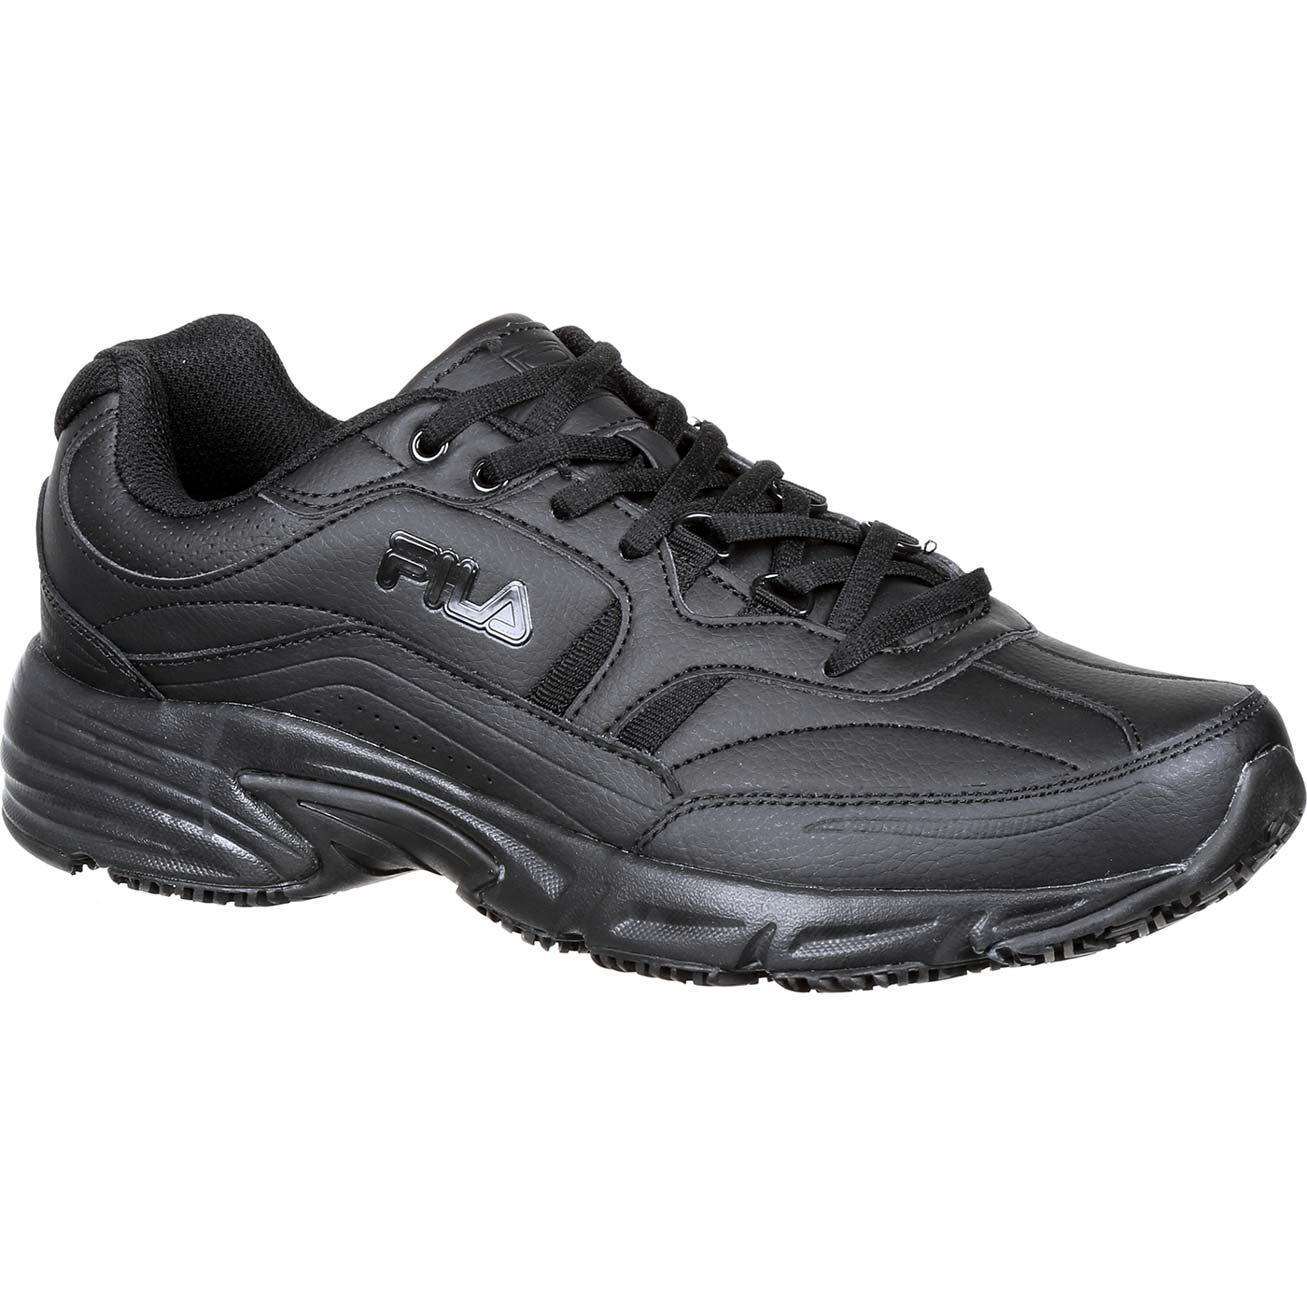 Fila Memory Workshift Mens Slip Resistant Athletic Shoes